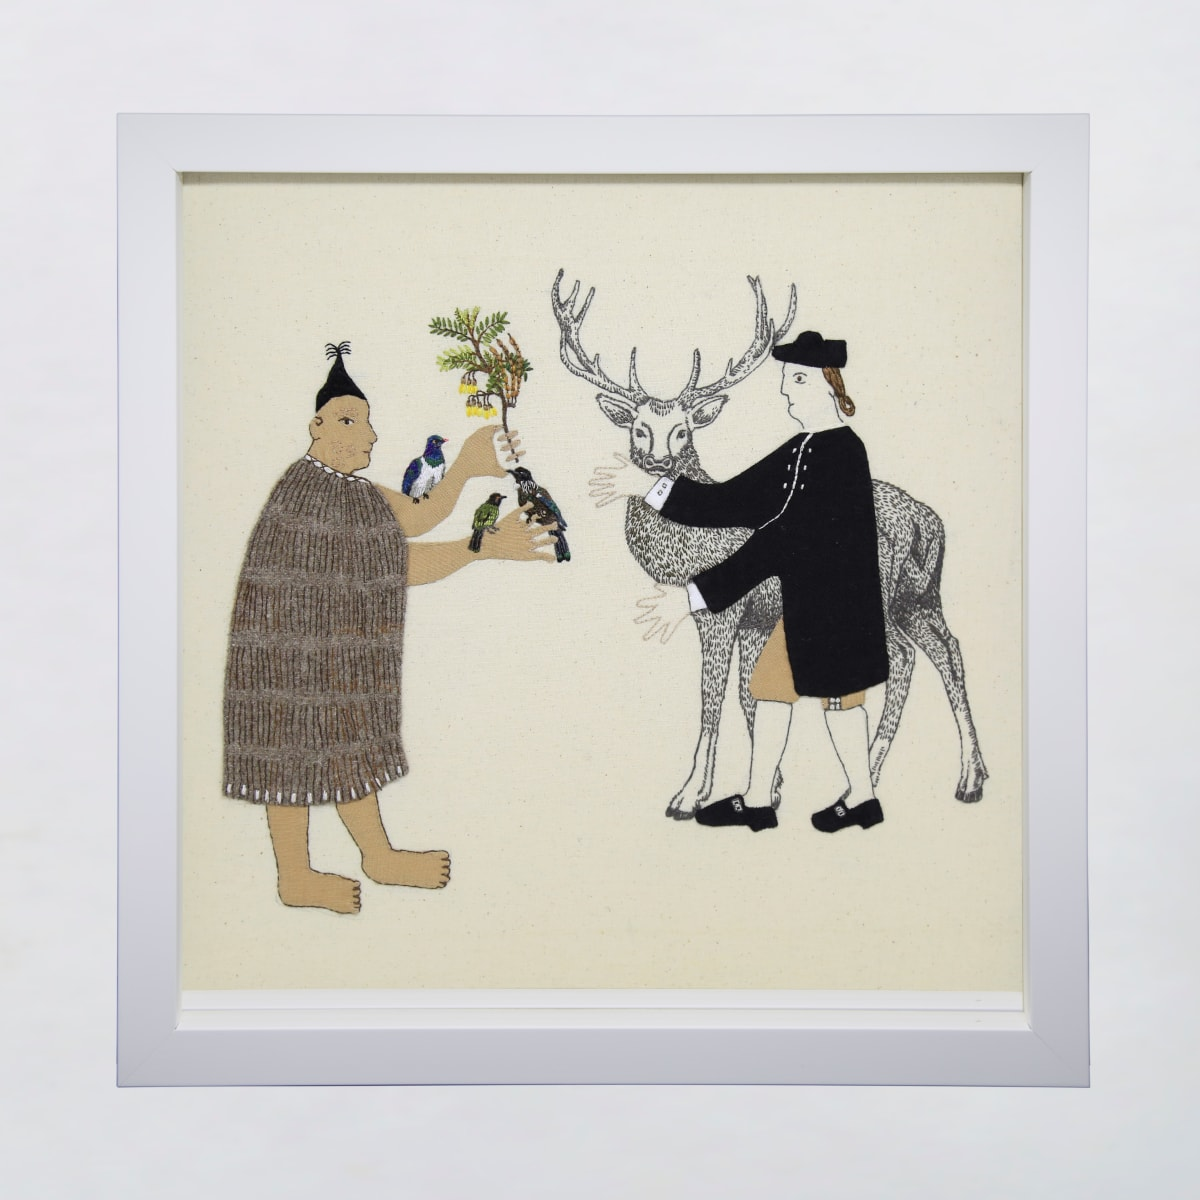 Sarah Munro Trade Items - Kowhai, Manu, Deer, 2019 cloth and thread 330mm x 330mm